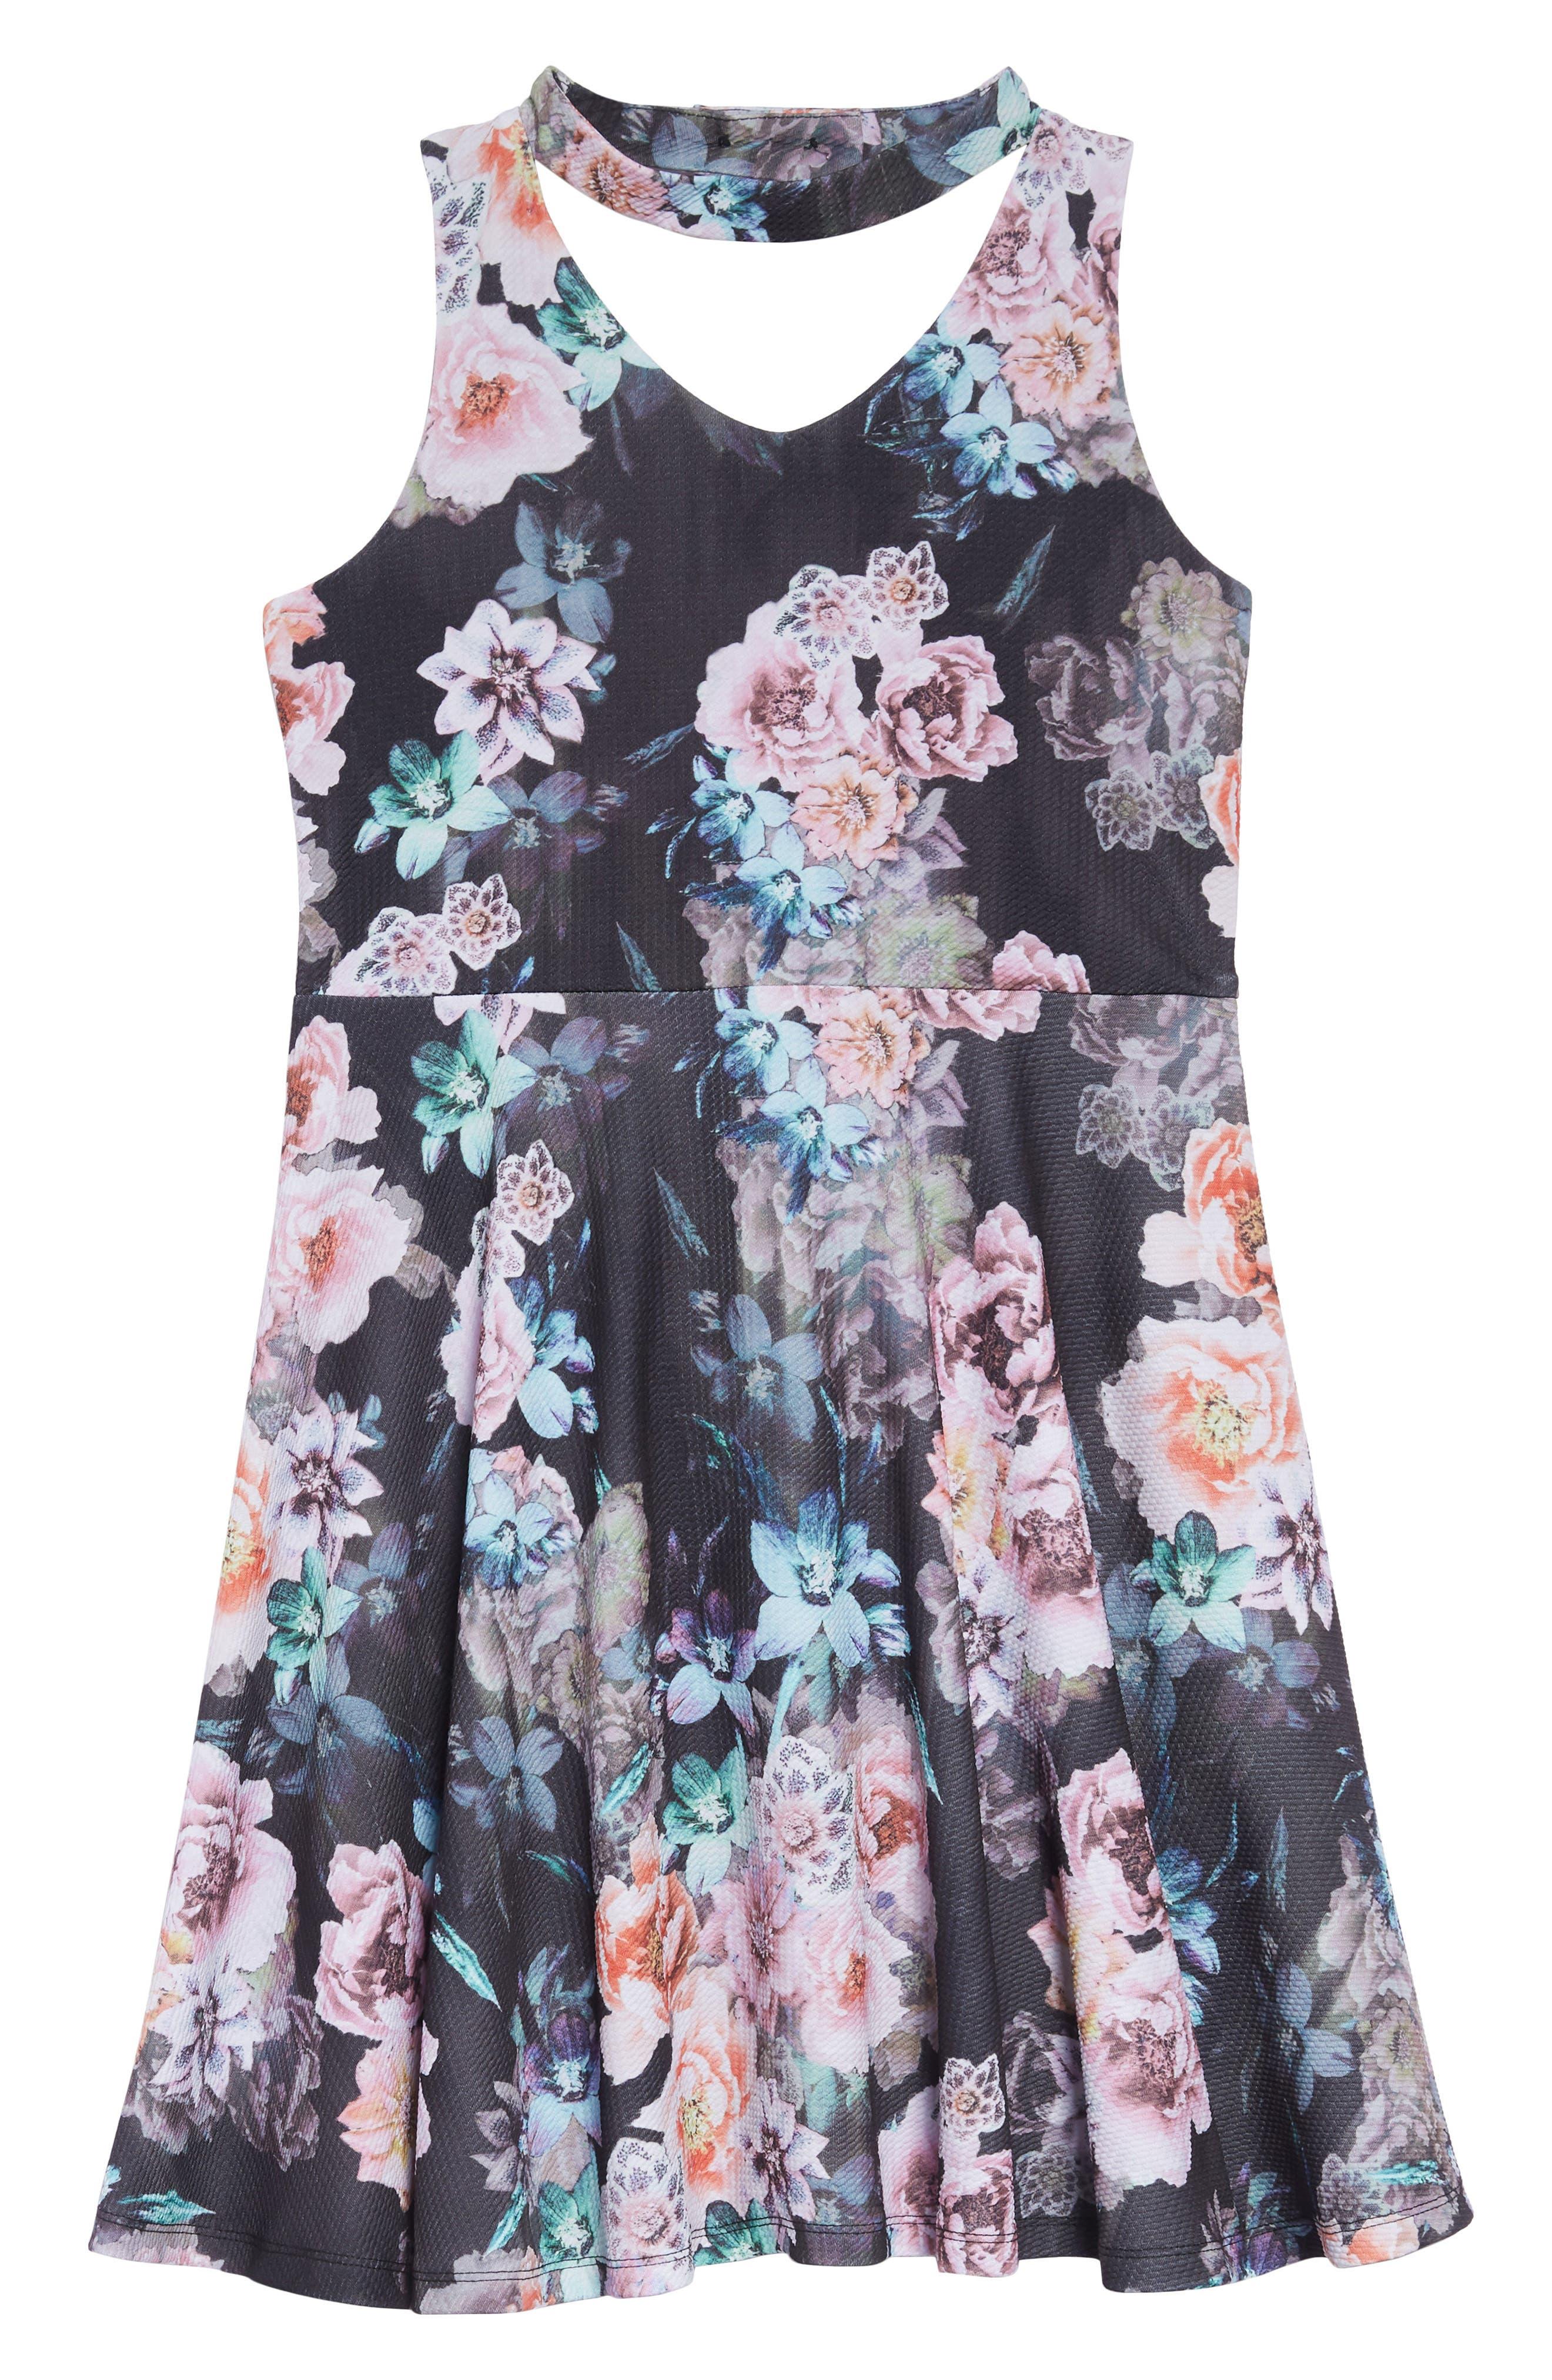 Gigi Floral Skater Dress,                             Main thumbnail 1, color,                             BLACK